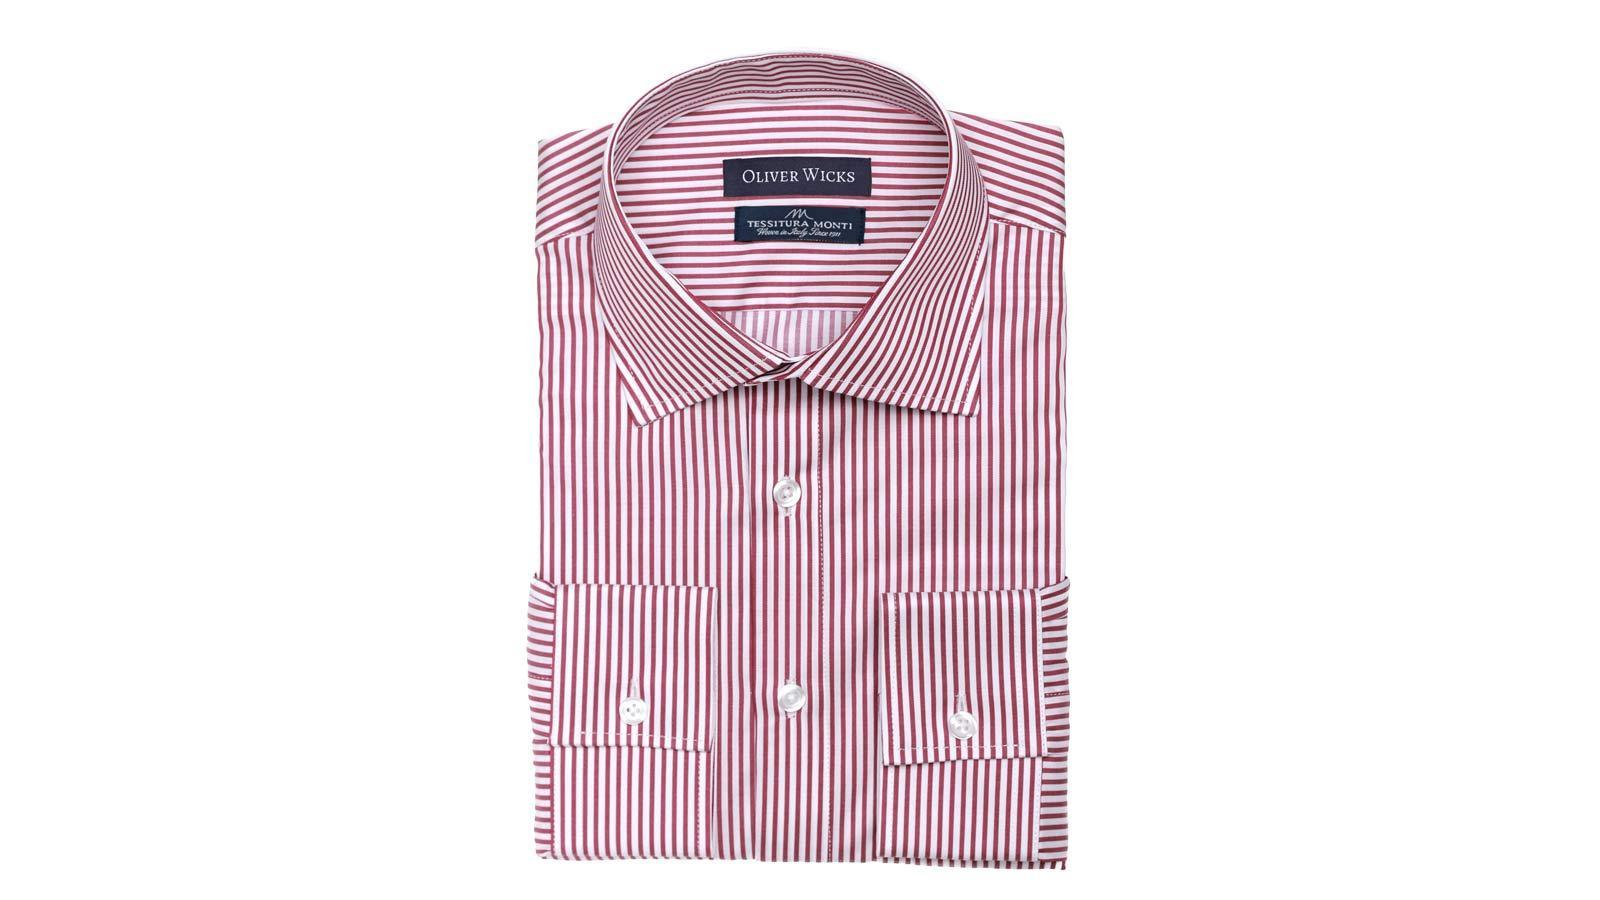 Men's Style Pro Red Striped Shirt - slider image 1